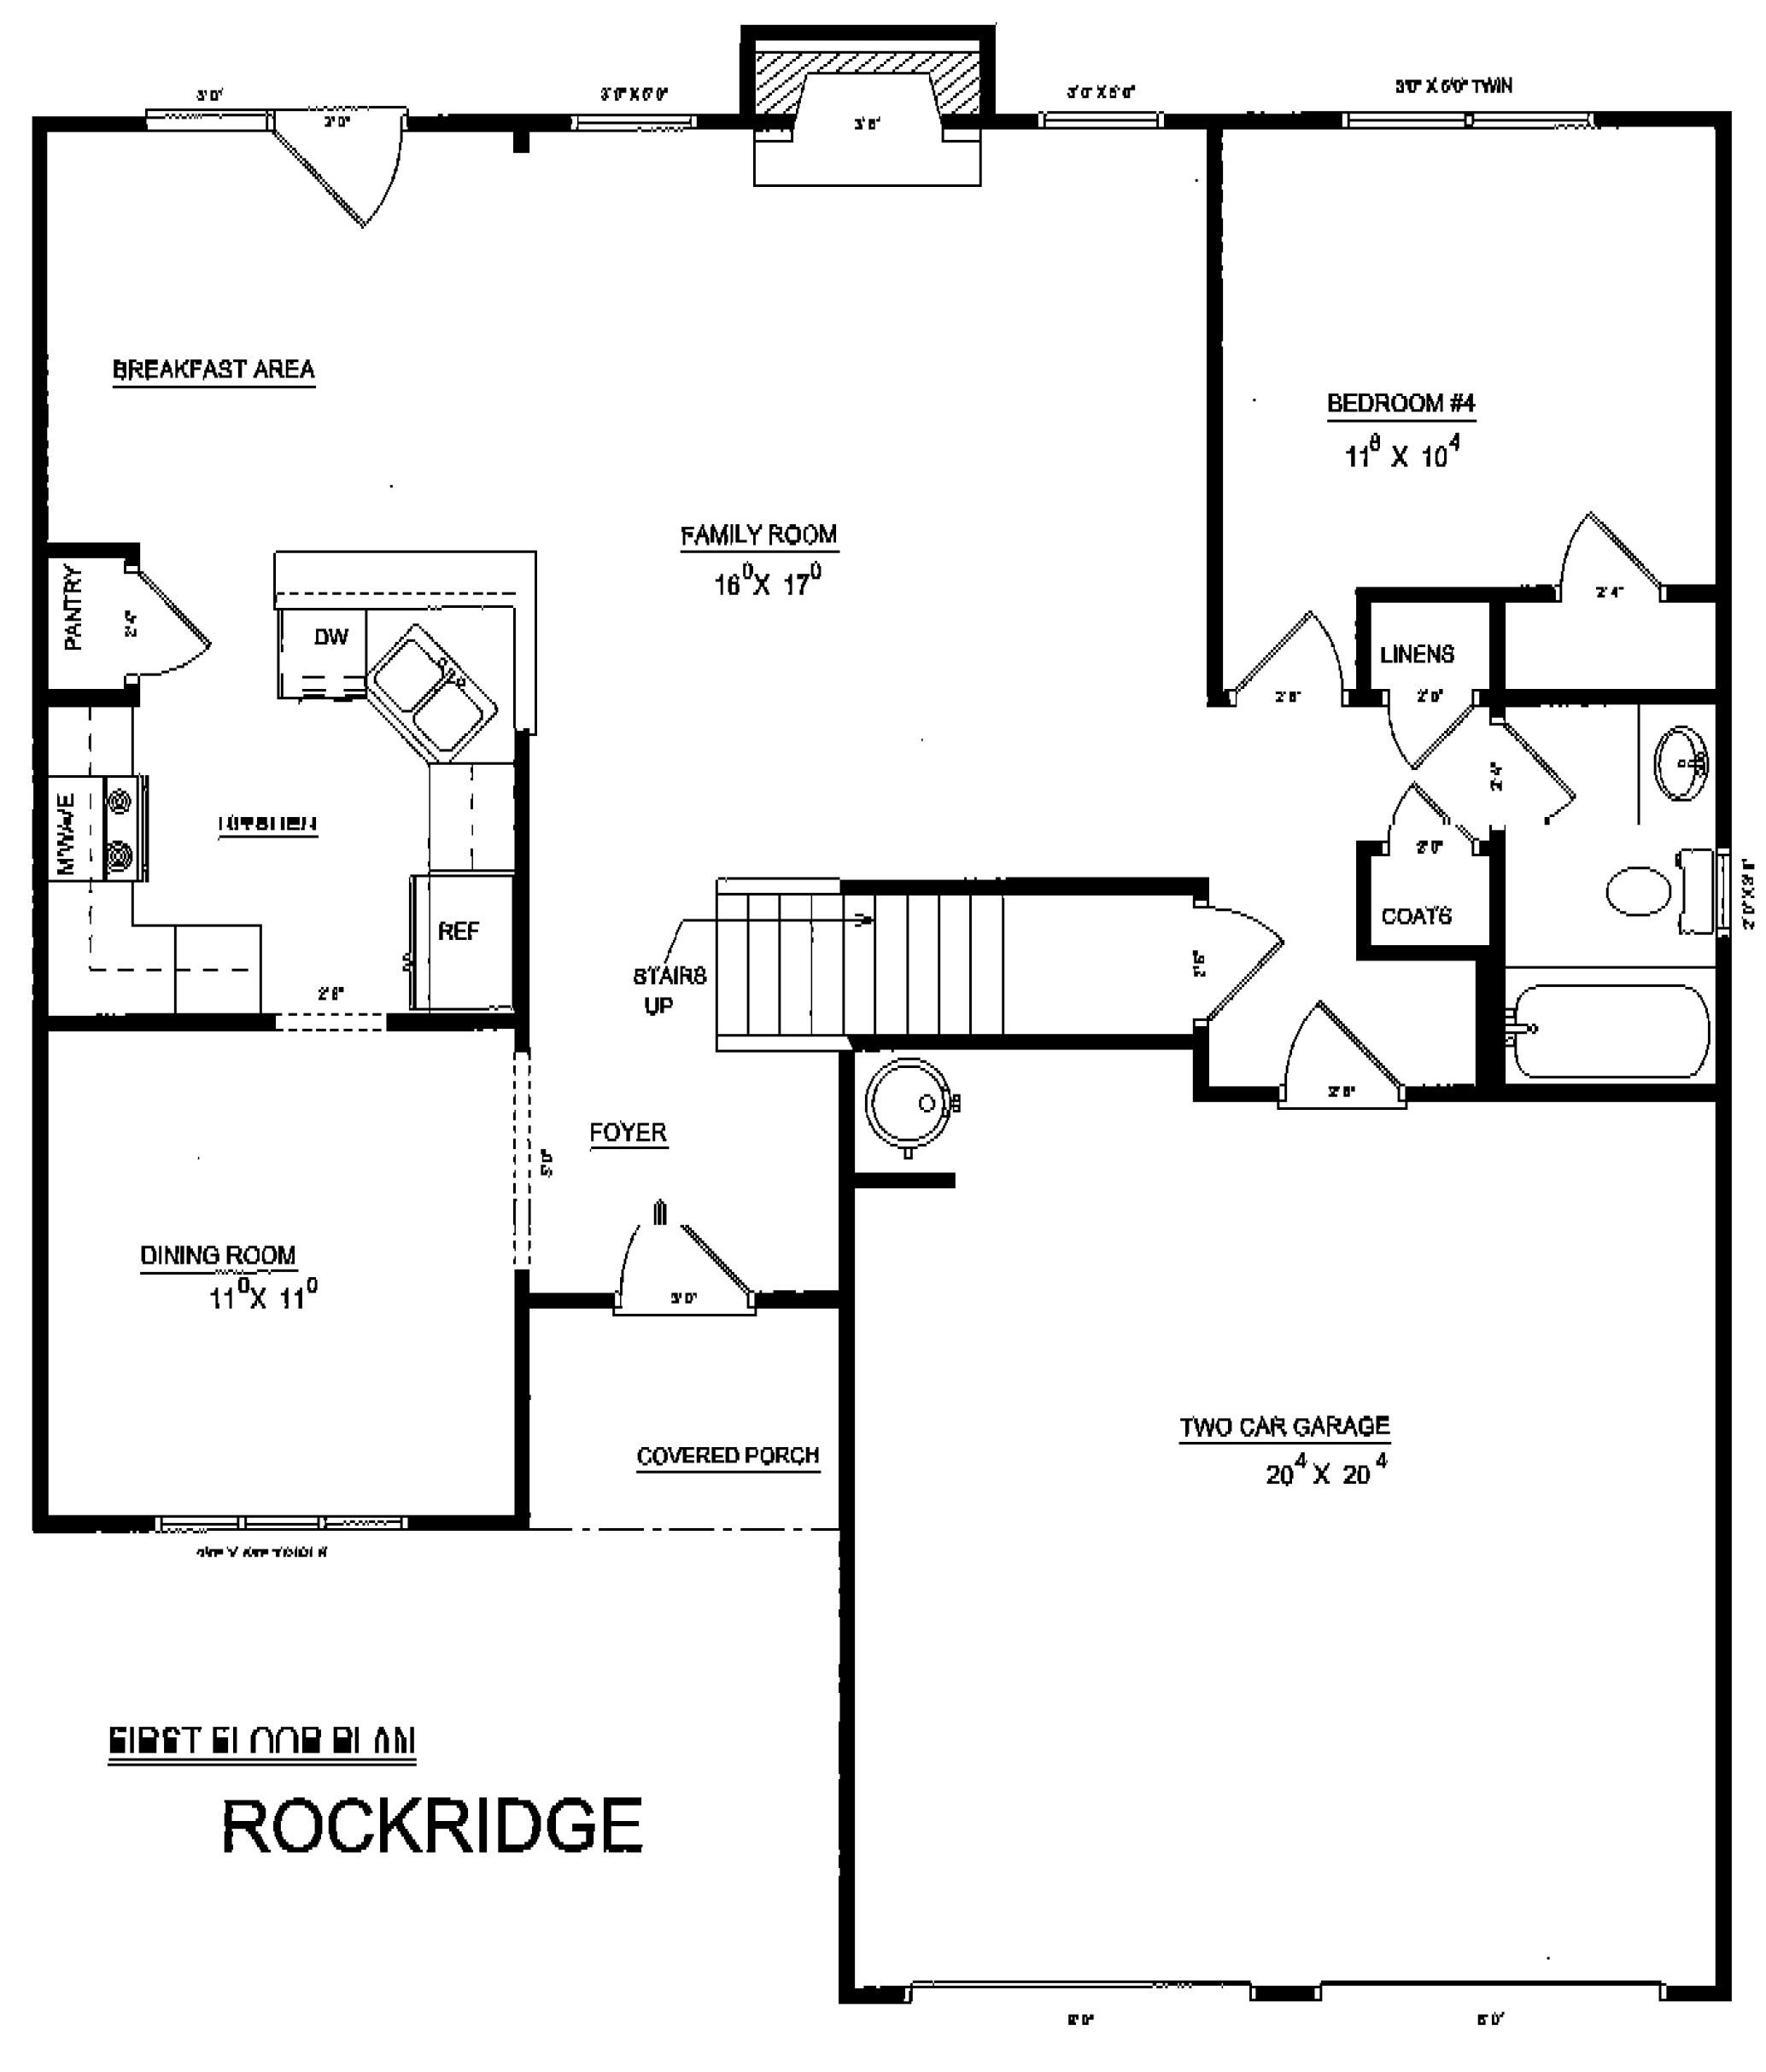 The Rockridge